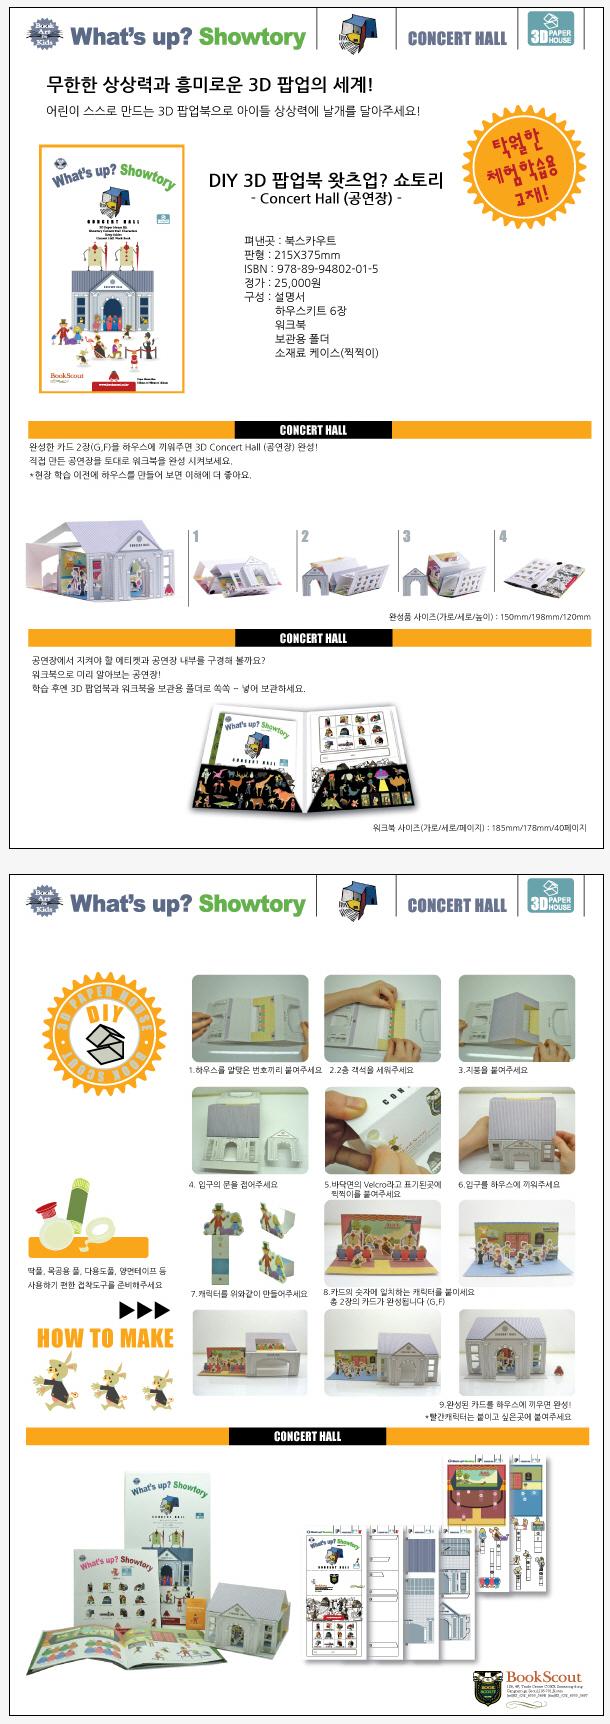 WHATS UP SHOWTORY: CONCERT HALL(왓츠업 쇼토리: 공연장)(3D팝업북)(팝업북) 도서 상세이미지